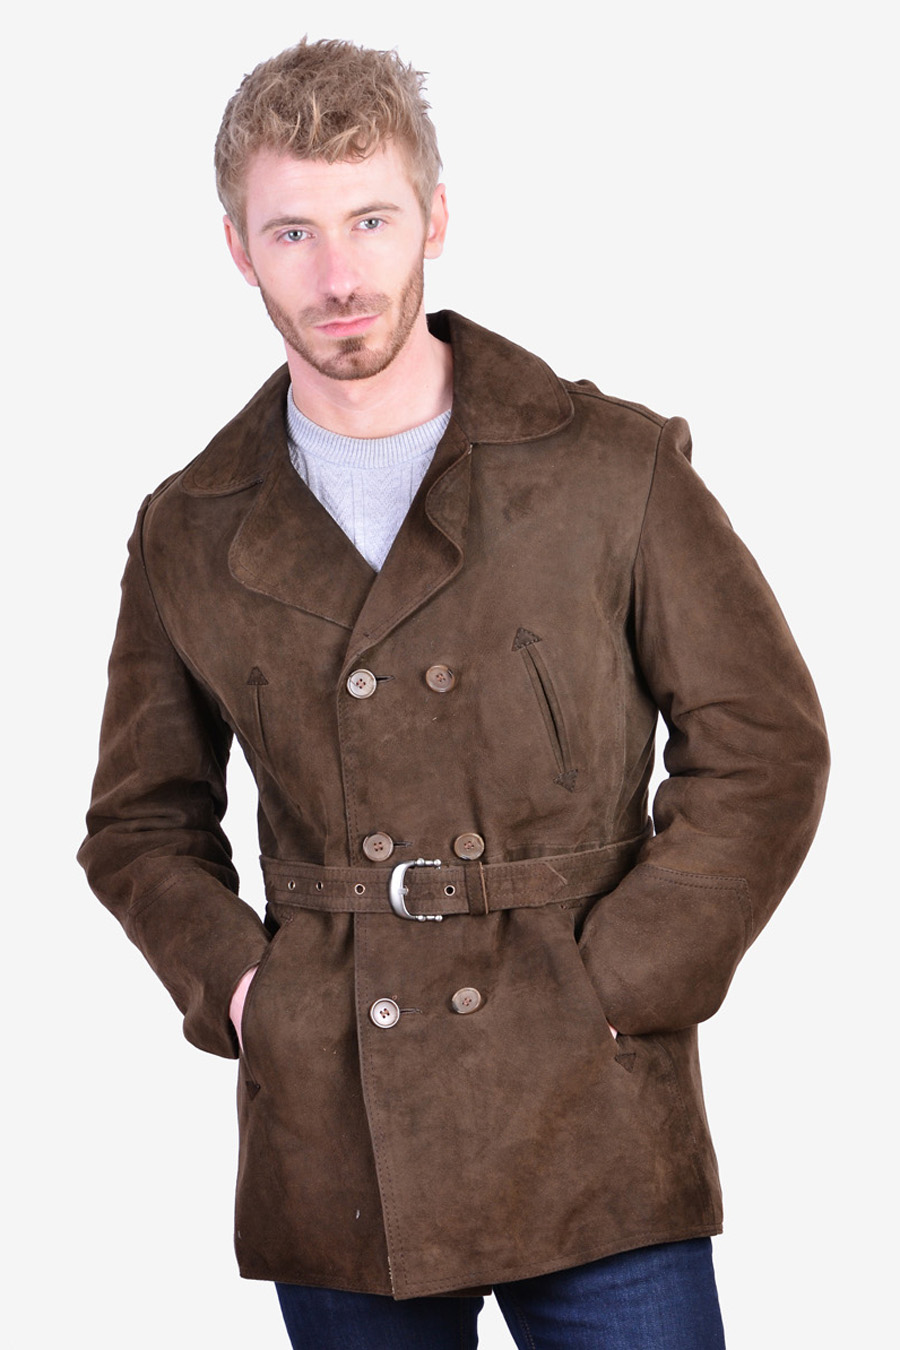 Vintage 1970's men's suede jacket